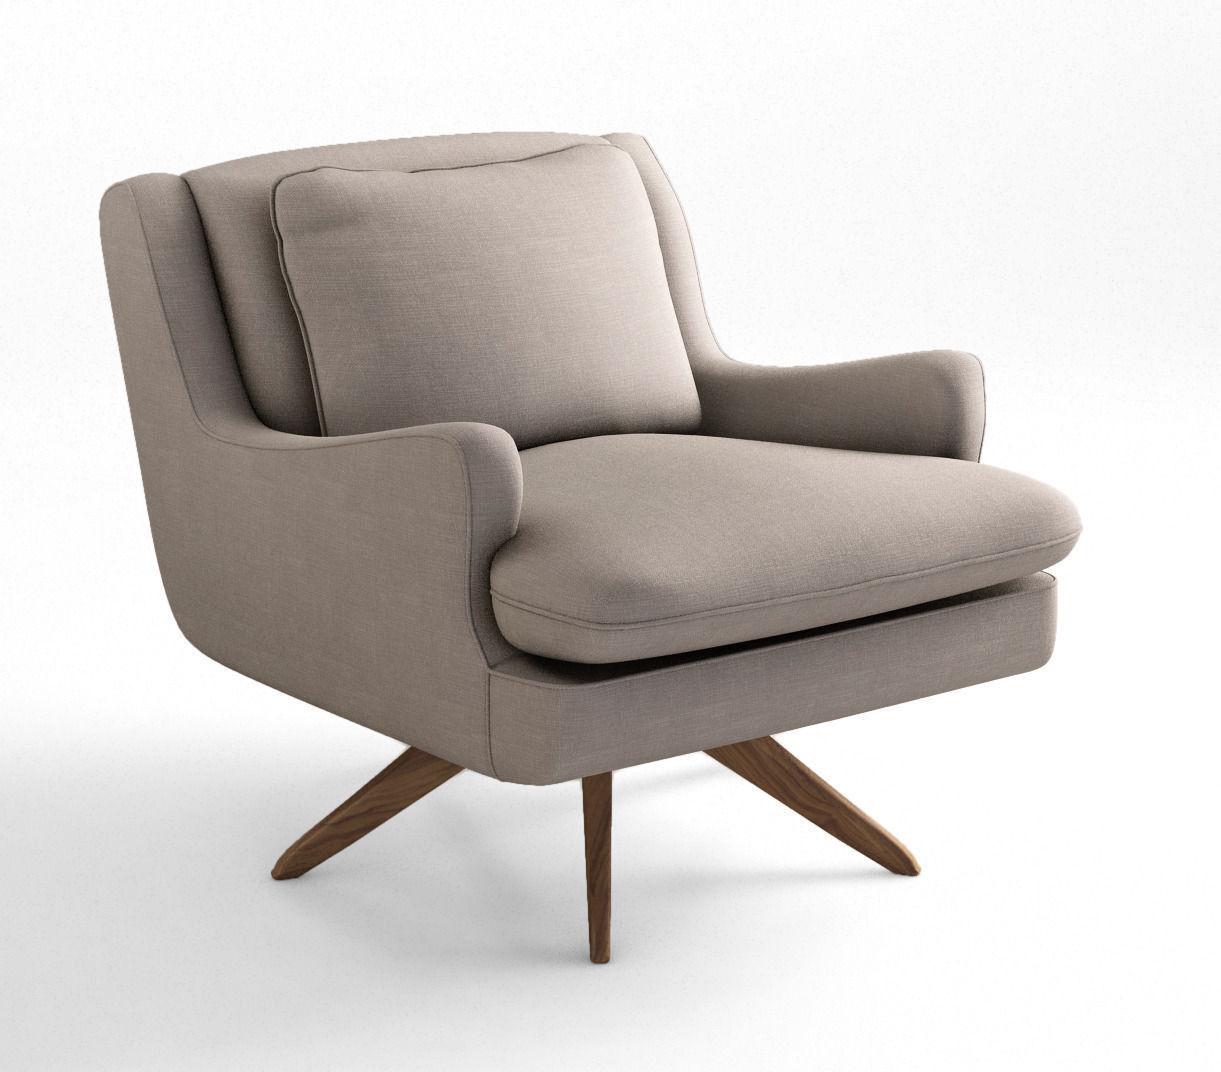 Vladimir Kagan Venetian Lounge Armchair 3d Model Max Obj Mtl Tga 1